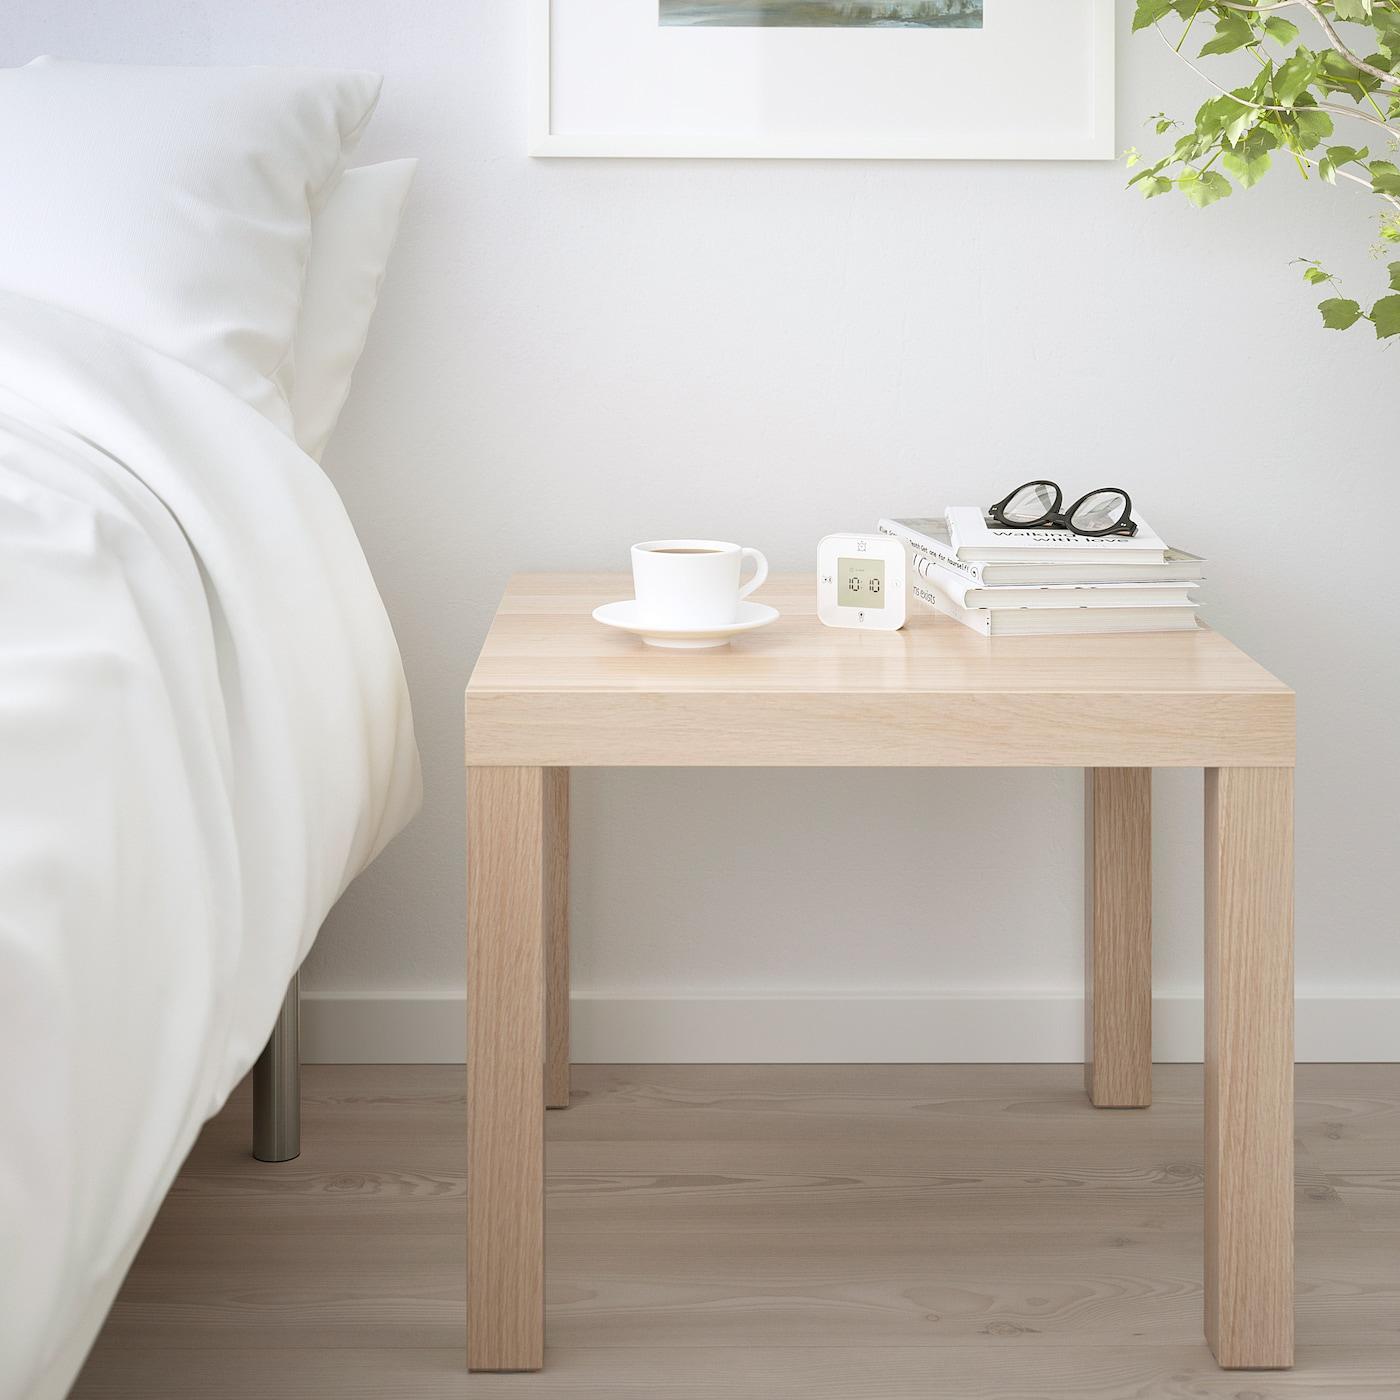 Lack Side Table White Stained Oak Effect 215 8x215 8 55x55 Cm Ikea